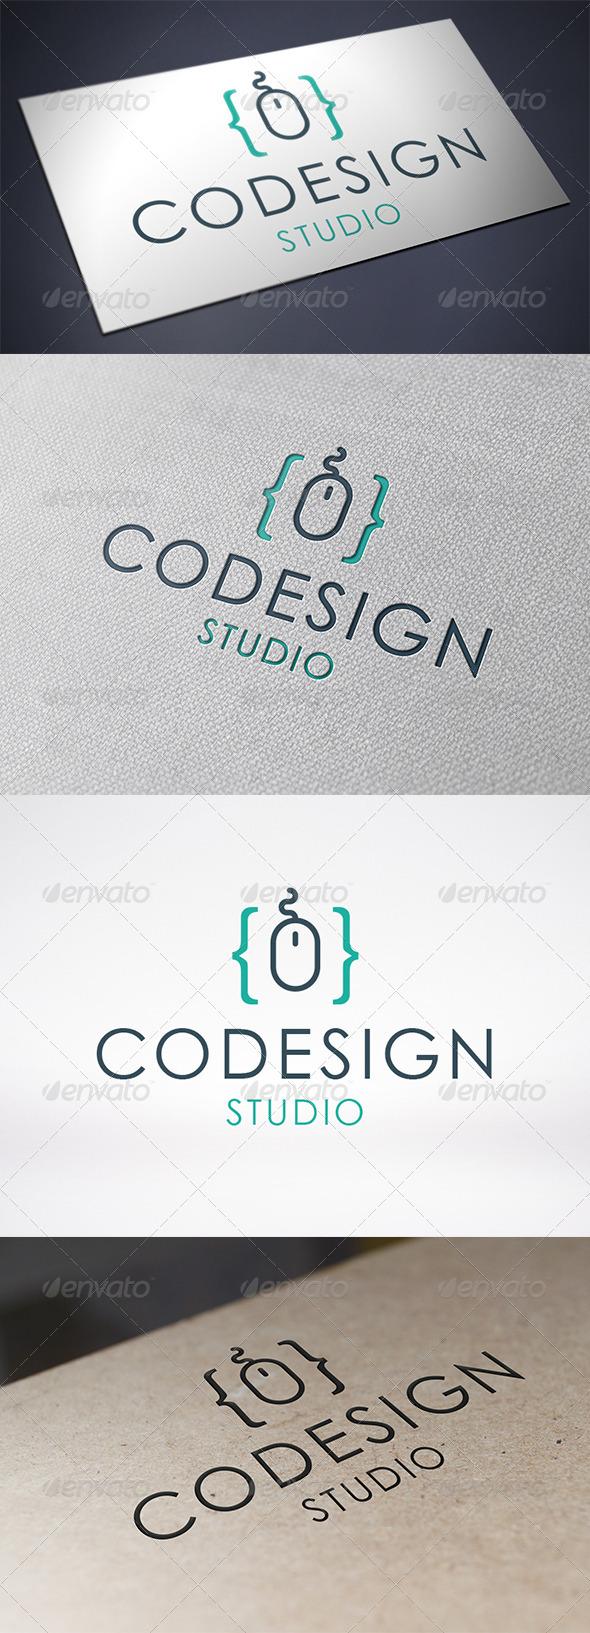 Code Design Logo Template